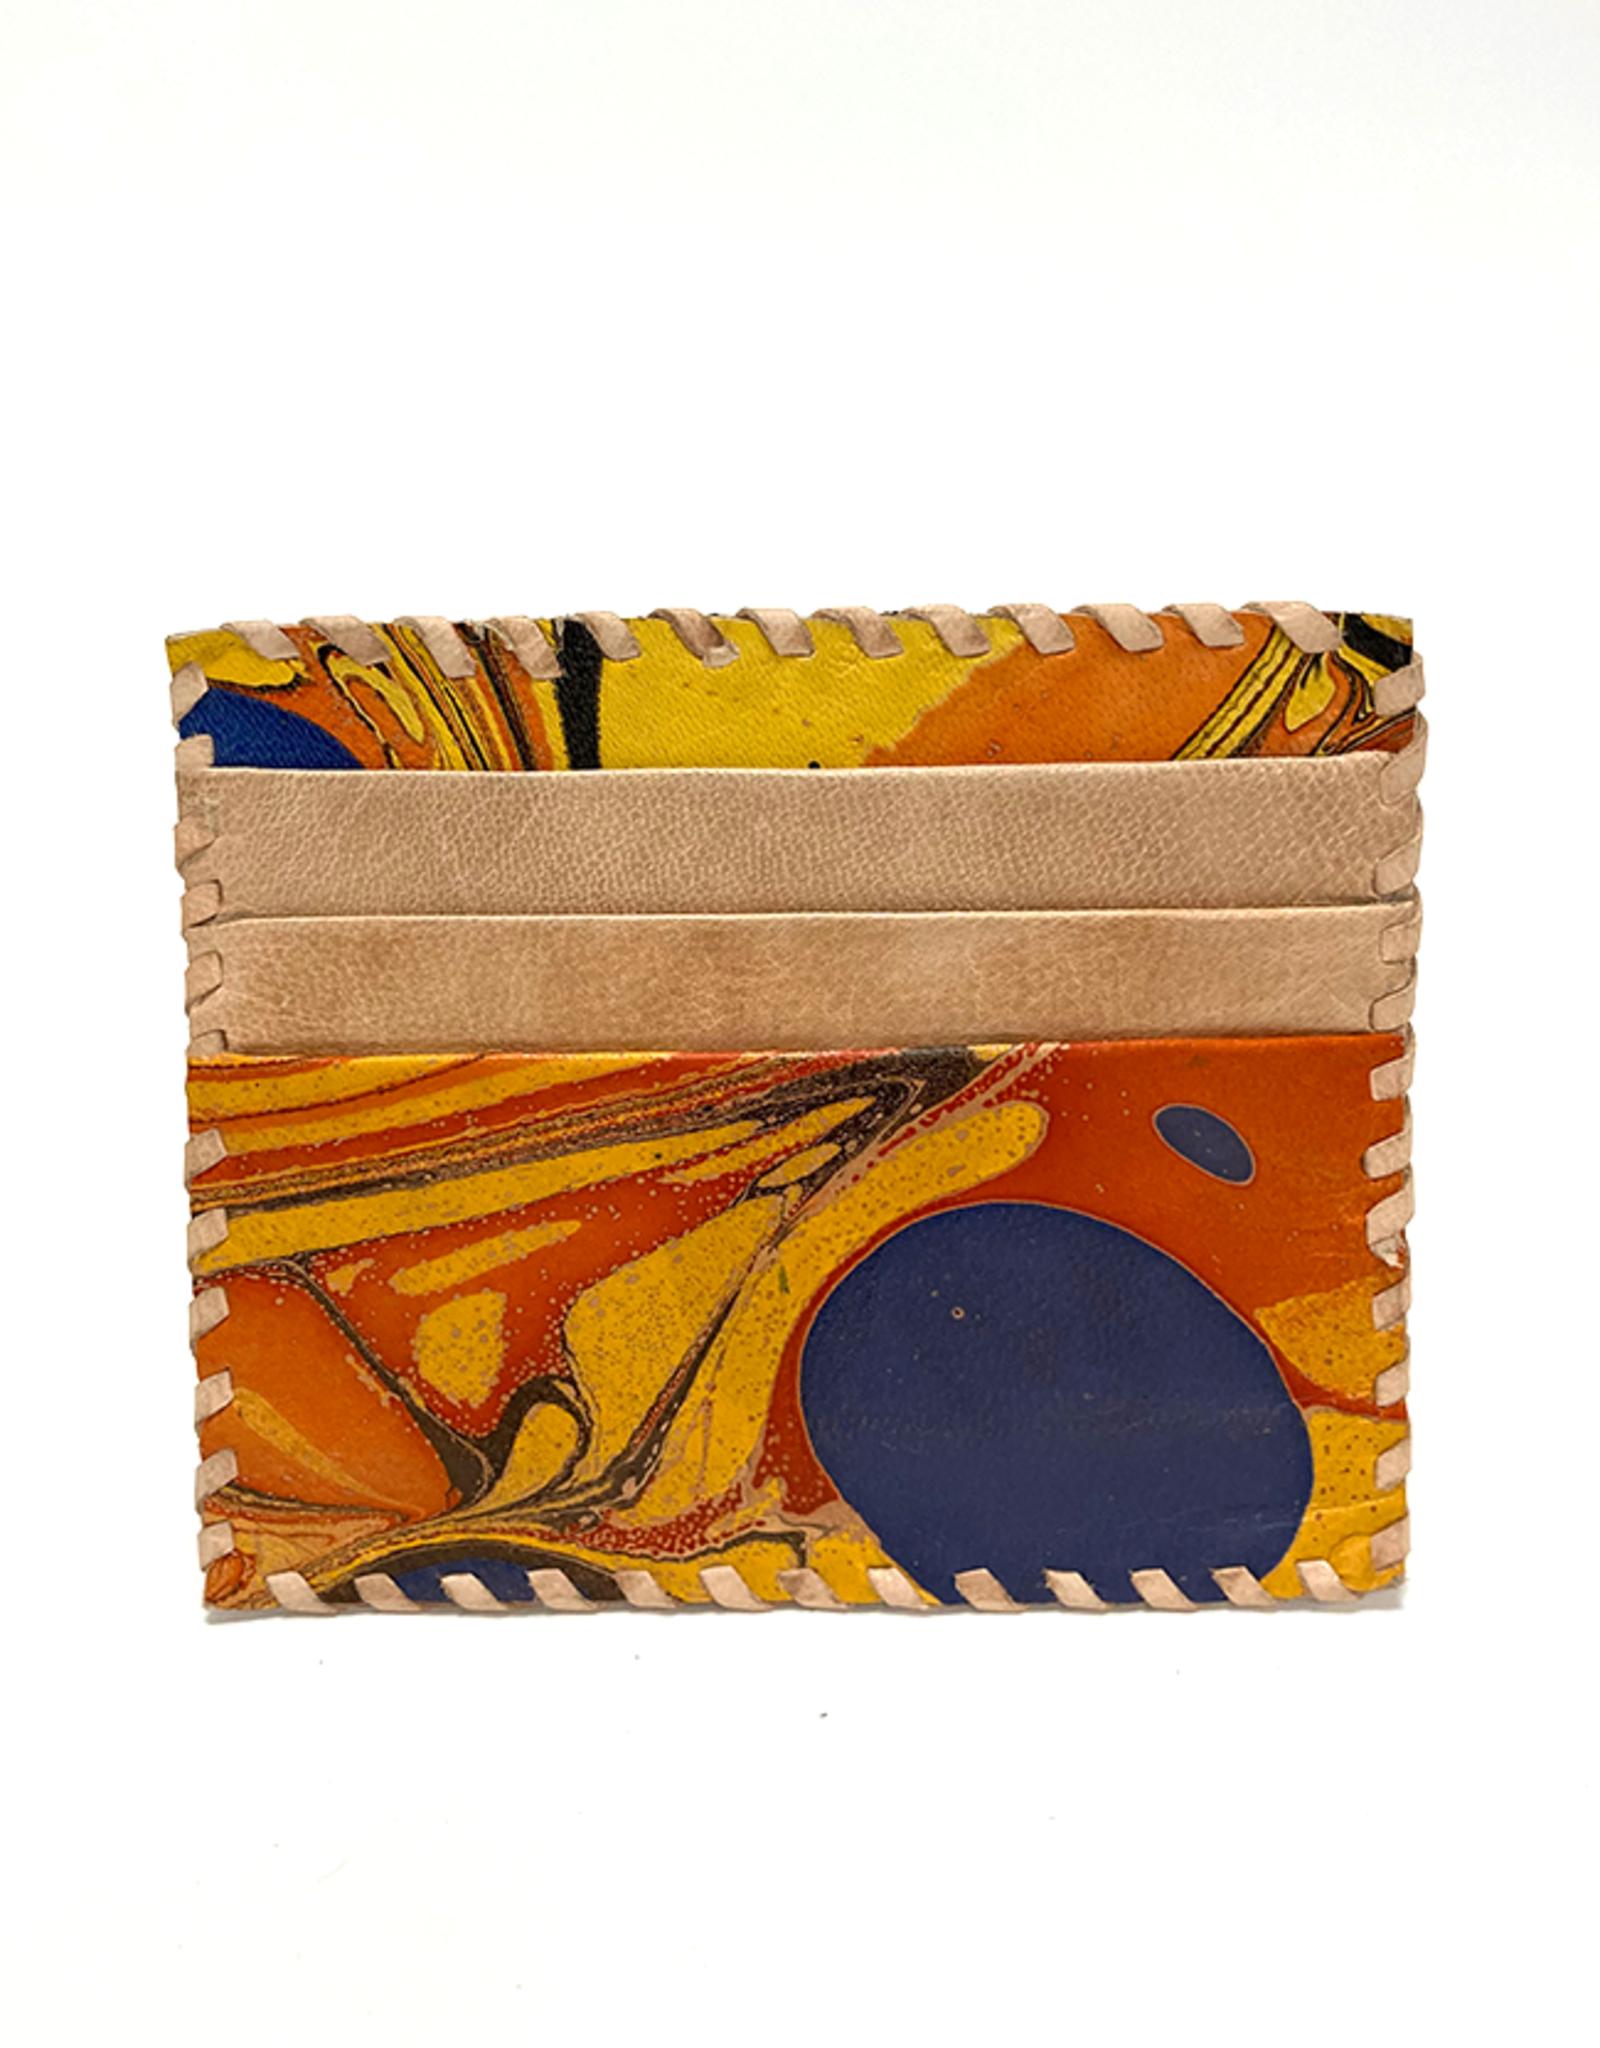 Indigo Yellow Marbled Leather Card Holder